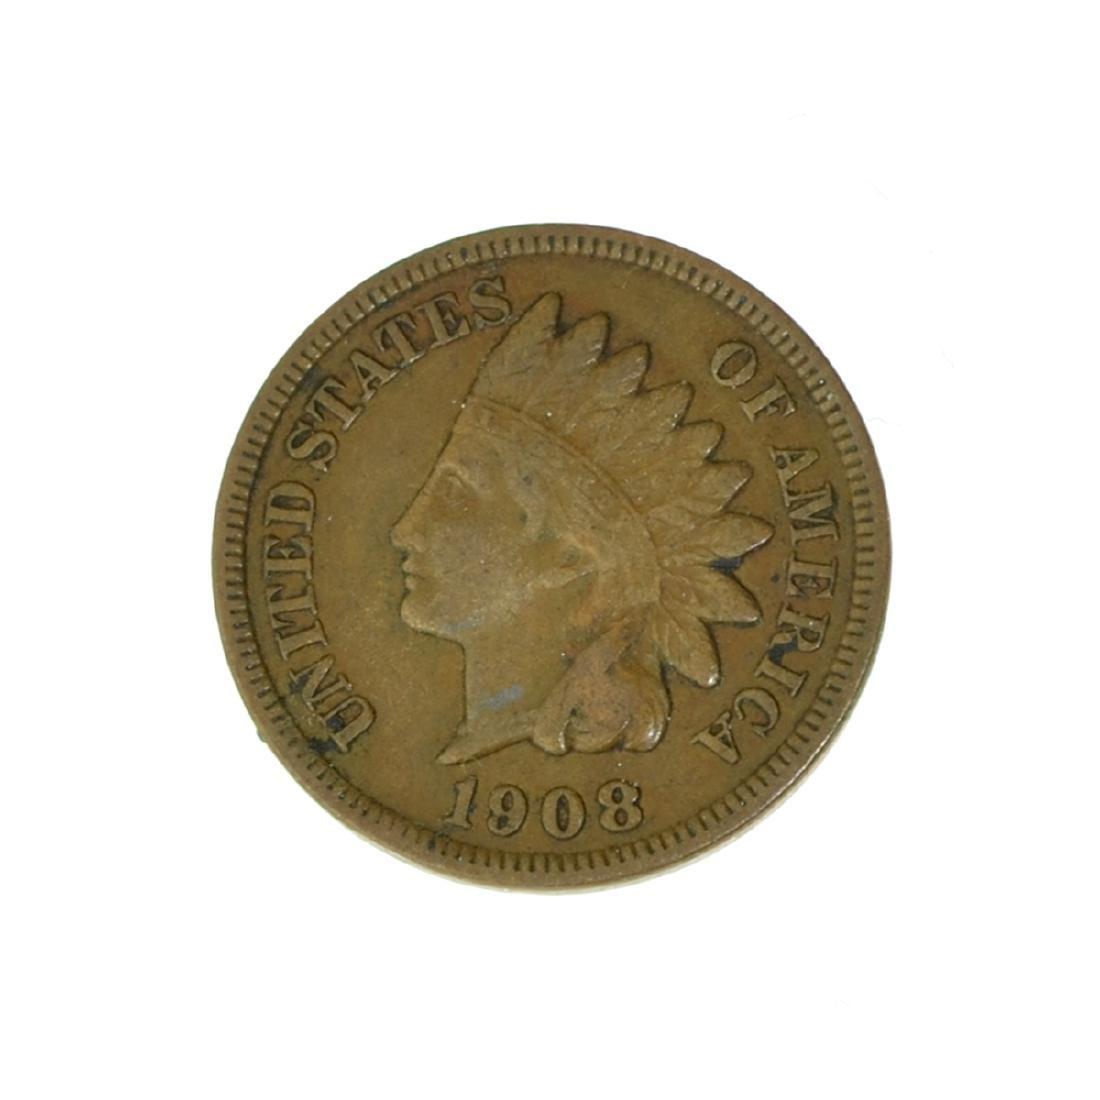 *1908-S Indian Cent Coin (JG)